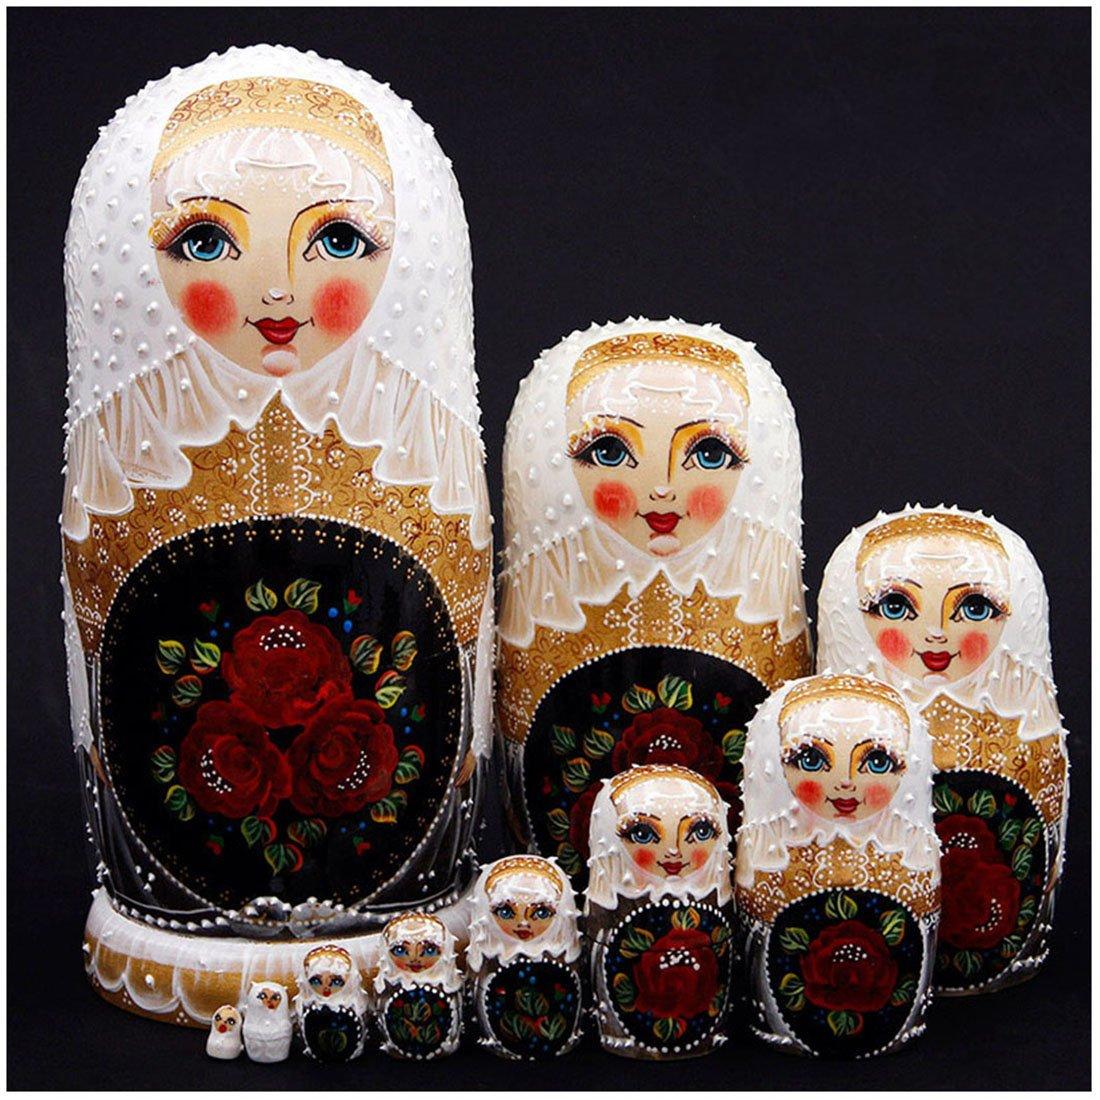 Debbieicy 10Pcs Beautiful Handmade Wooden Russian Nesting Dolls Wedding Dress Roses Princess Matryoshka Dolls Gift- Stacking Doll Set of 10 from 11.8'' Tall